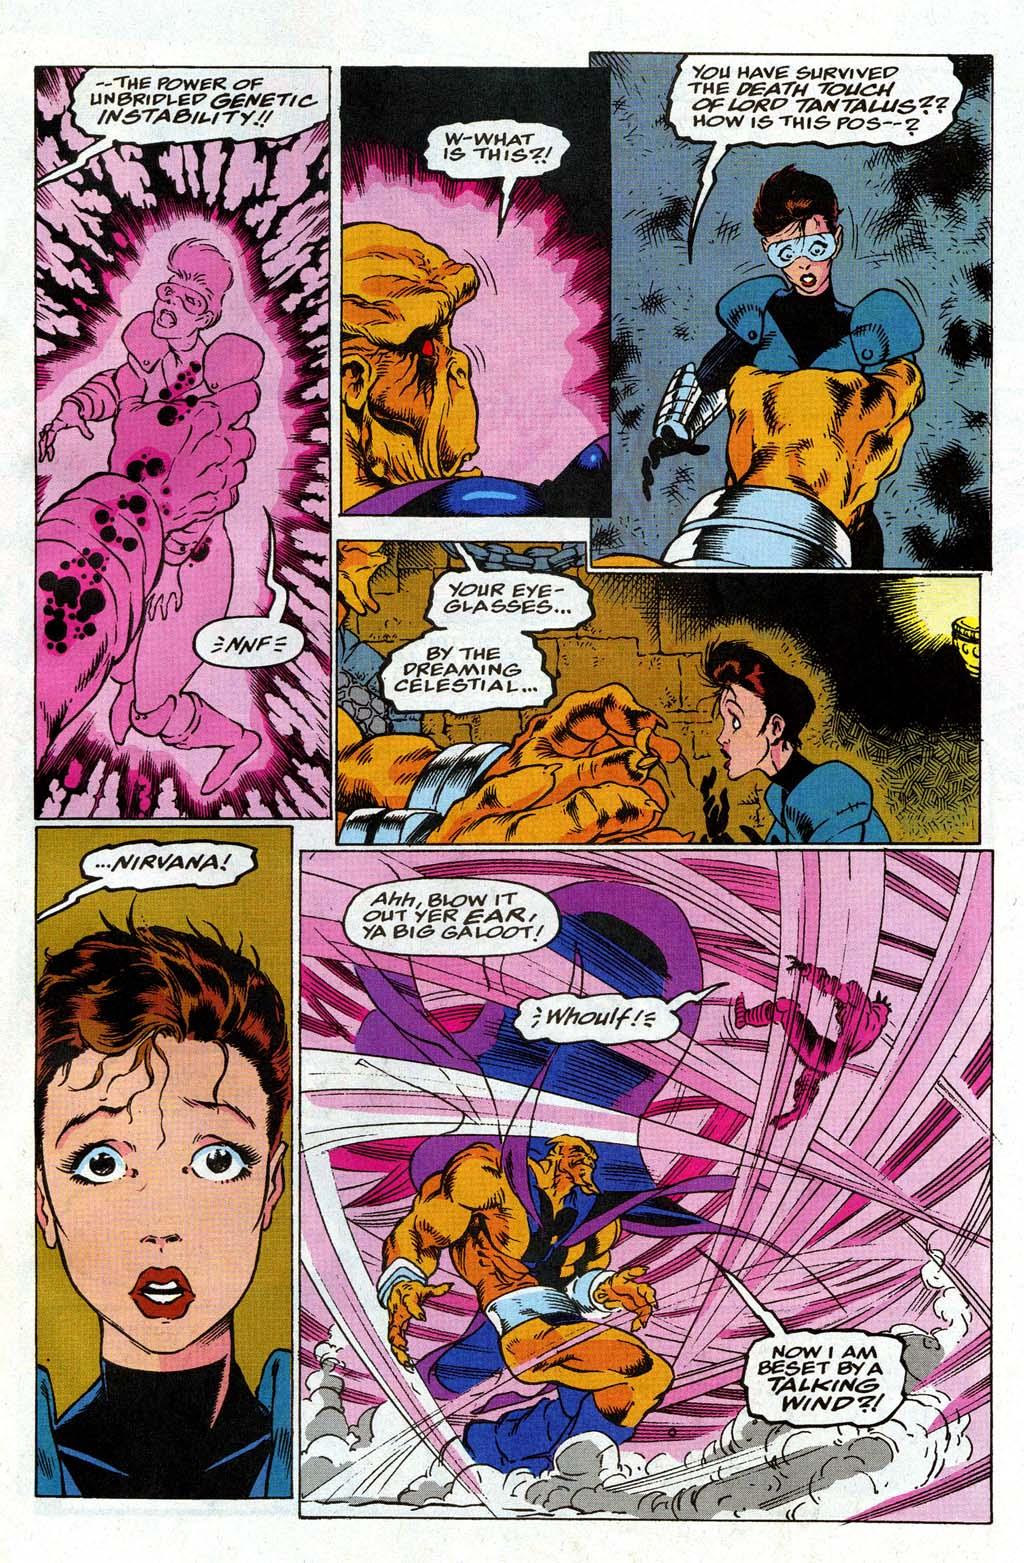 Read online Blackwulf comic -  Issue #9 - 8